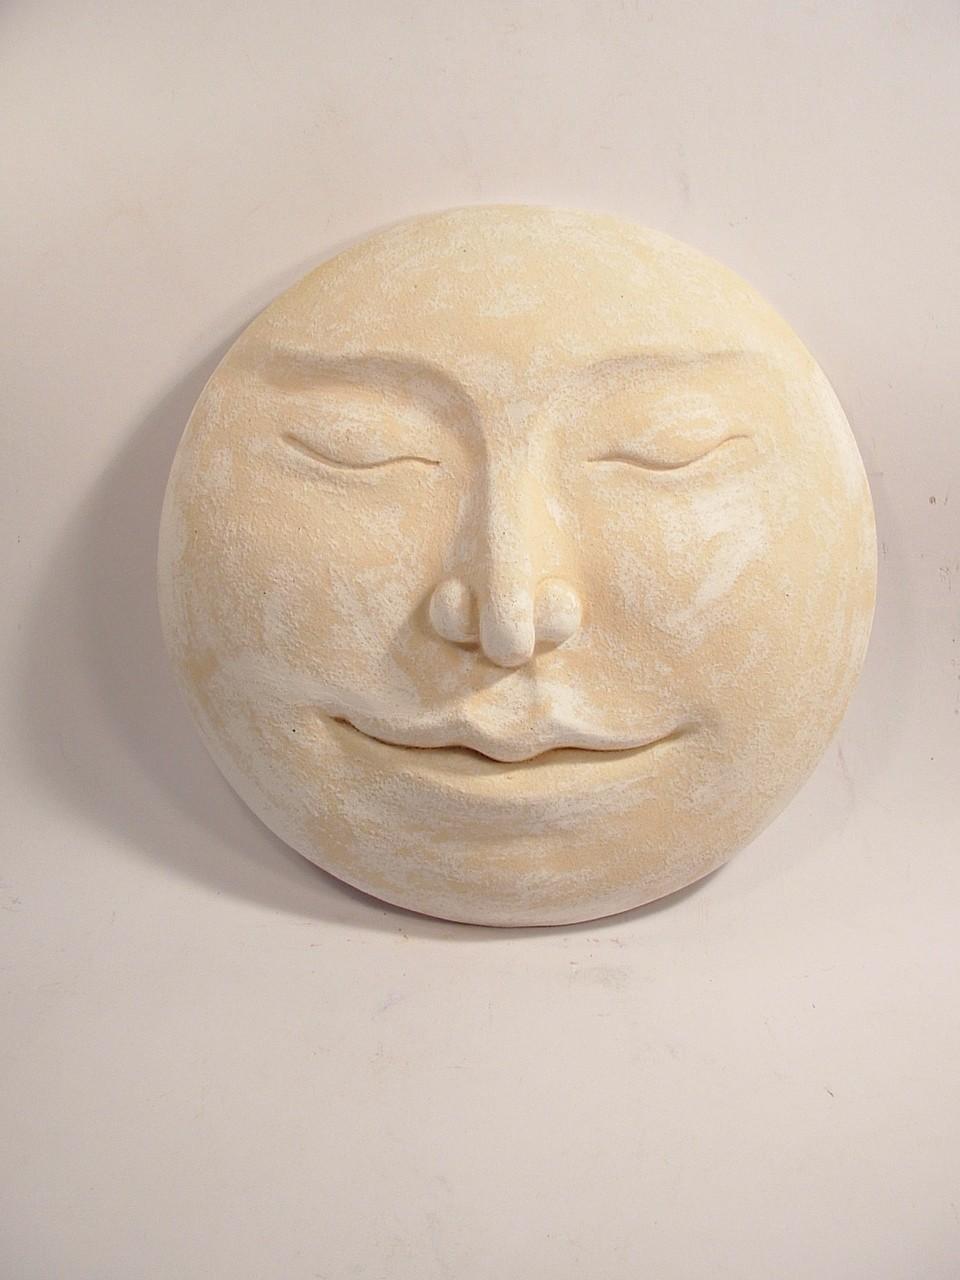 full moon sculpture, full moon wall hanging, moon sculpture, moon art, moon bas relief, full moon art, Ama Menec sculpture.